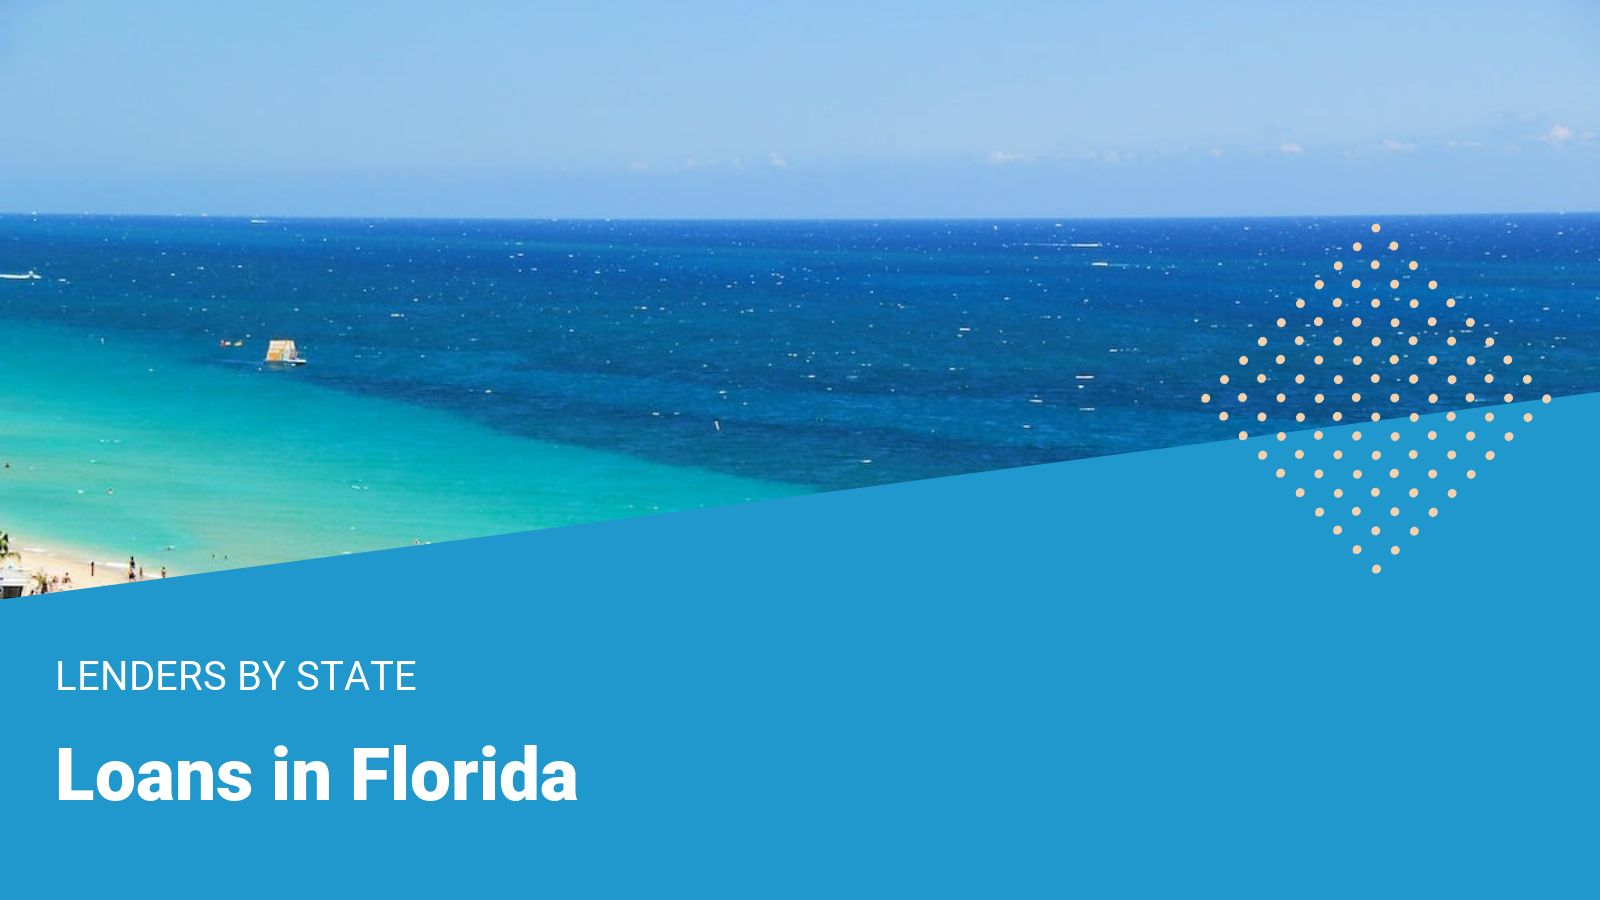 Florida loans